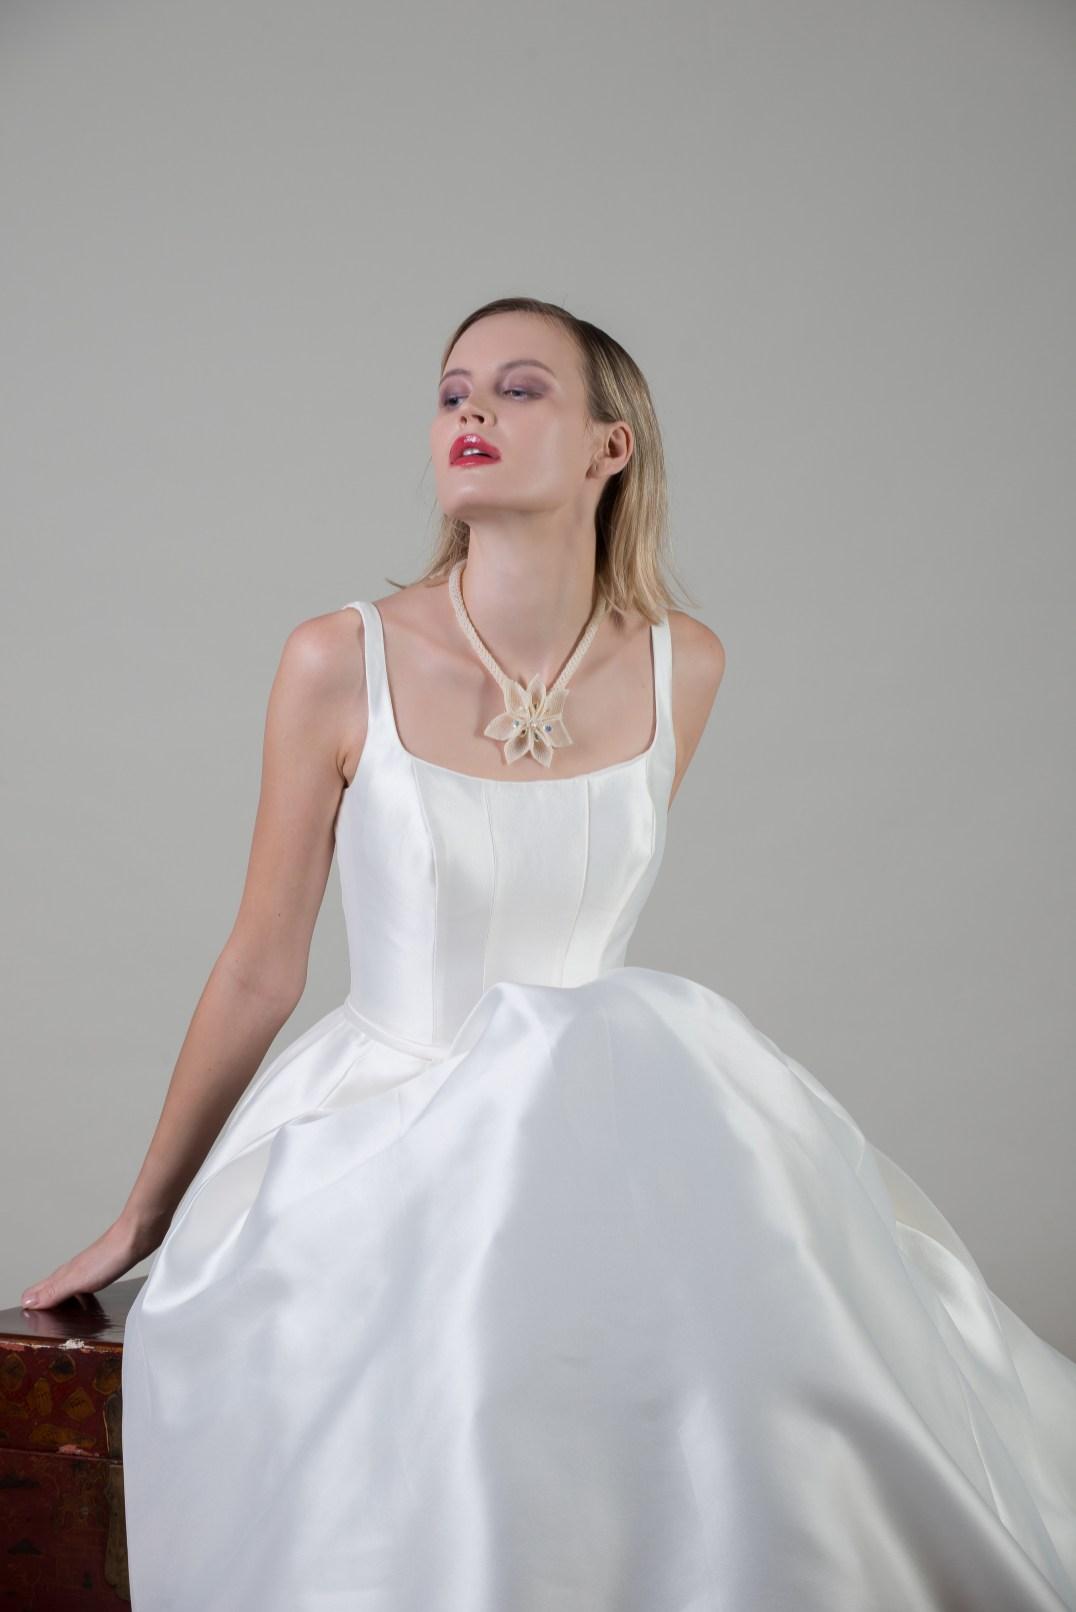 MiaMia Bologna bridal dress